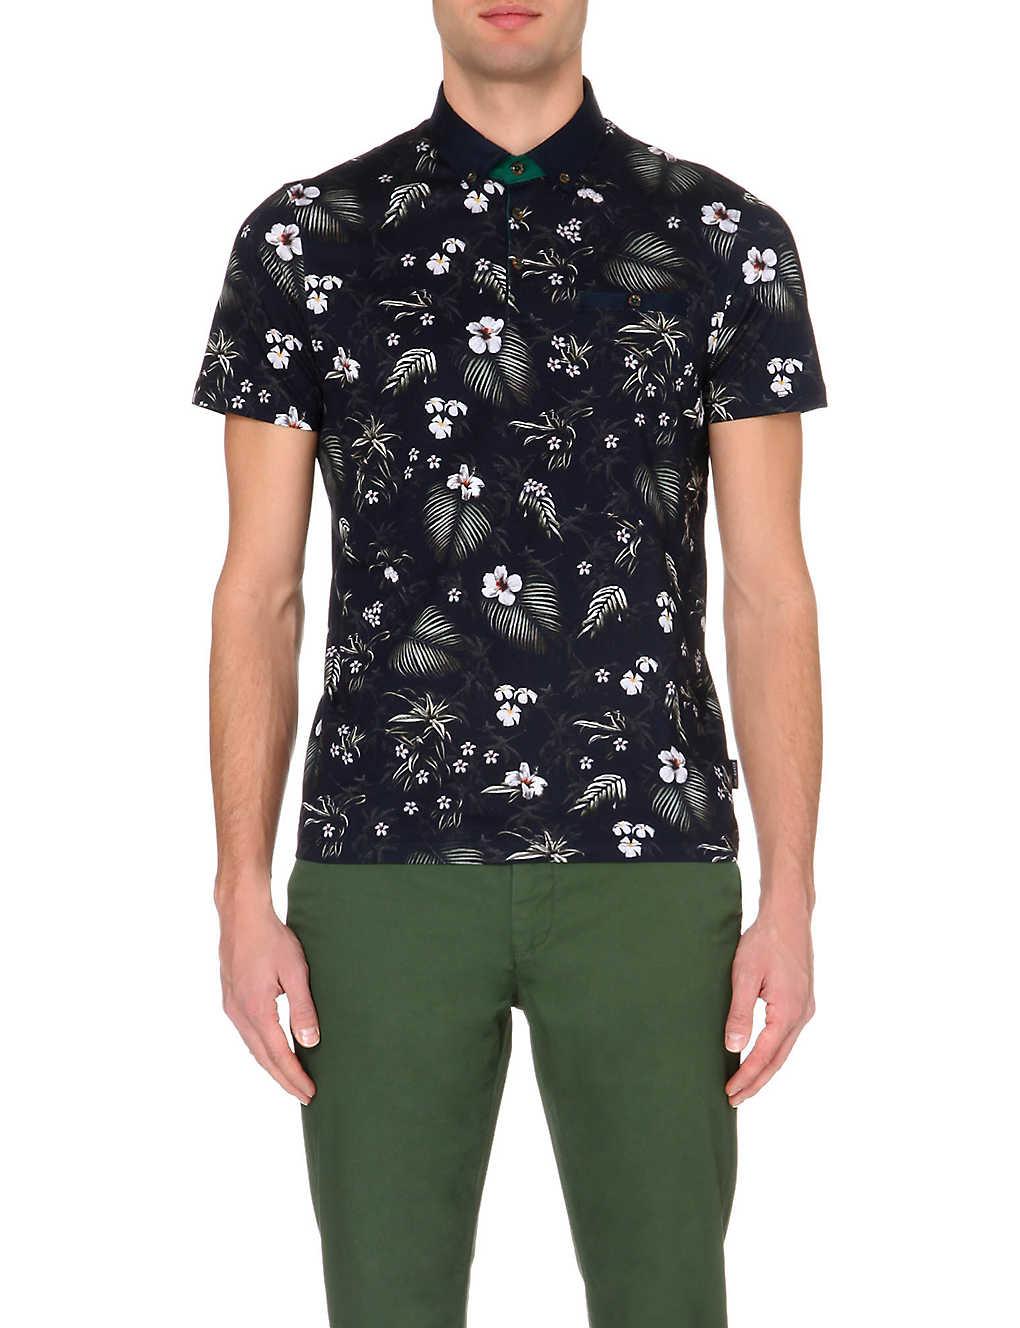 4b7714317c49e TED BAKER - Tropical-print polo shirt | Selfridges.com